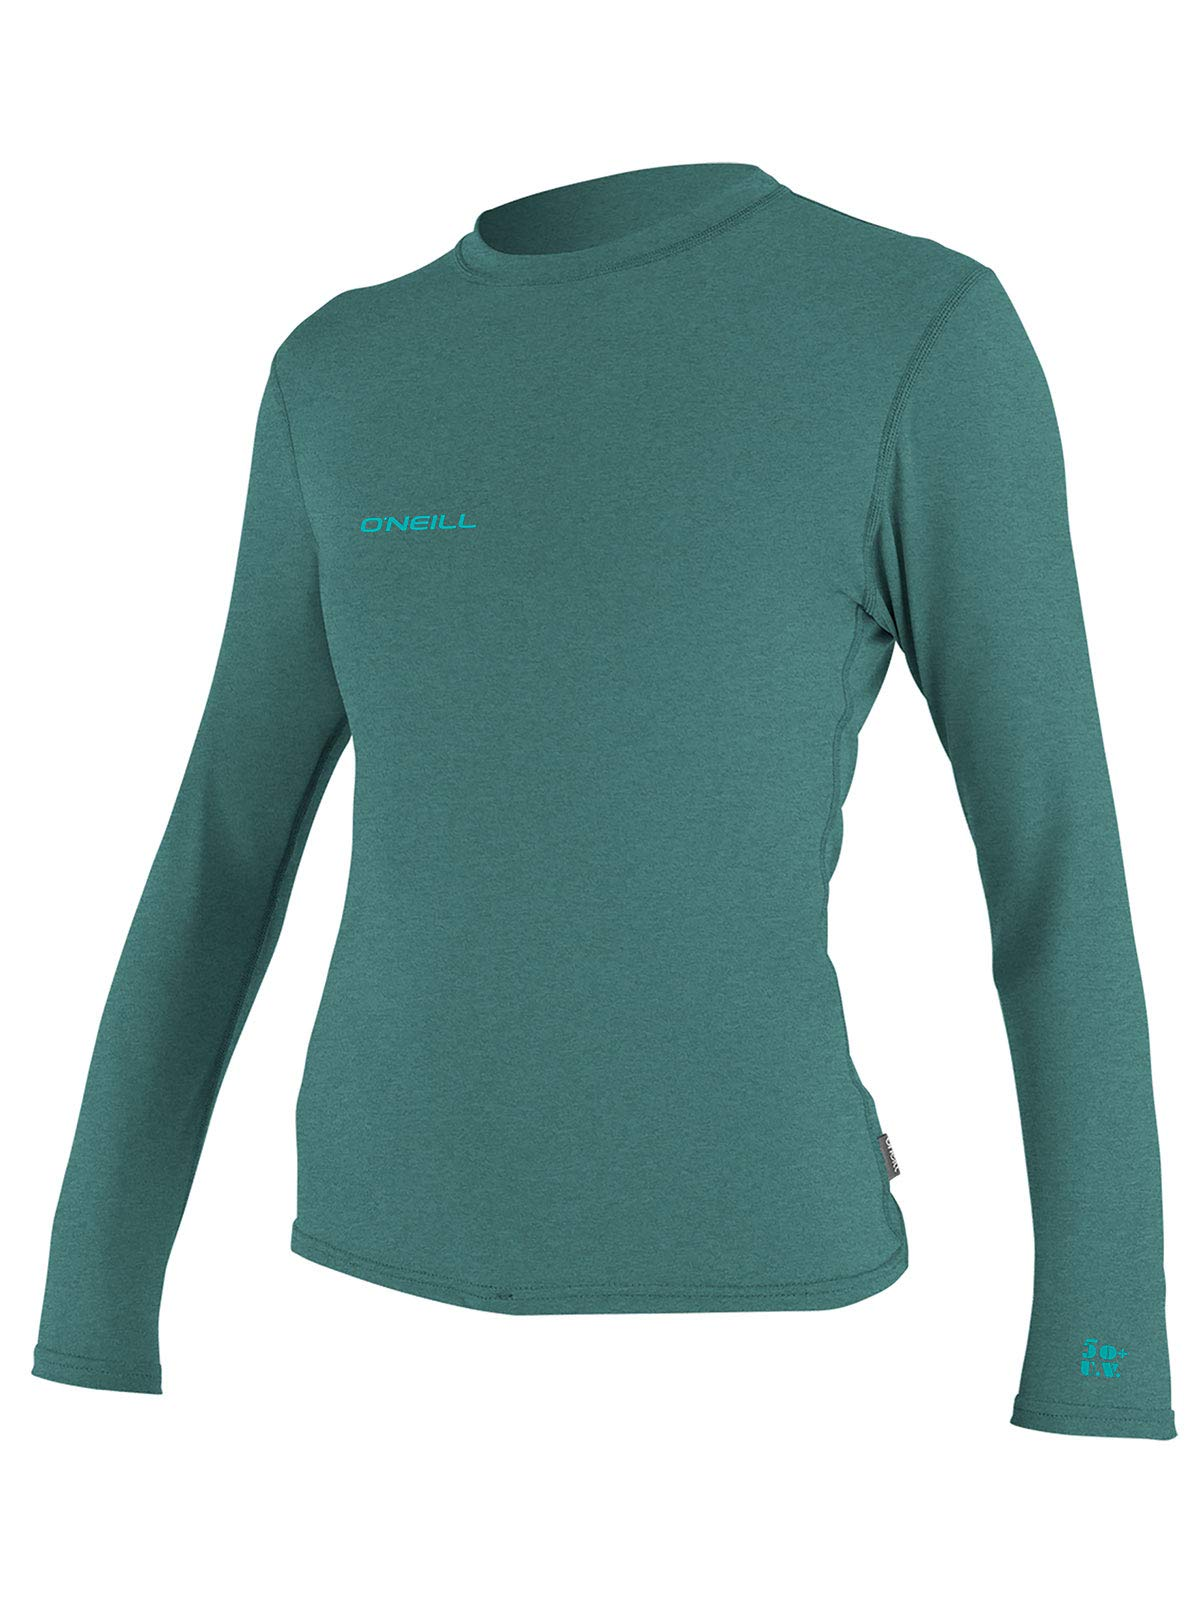 O'Neill Wetsuits Women's Hybrid UPF 50+ Long Sleeve Sun Shirt, Eucalyptus, X-Small by O'Neill Wetsuits